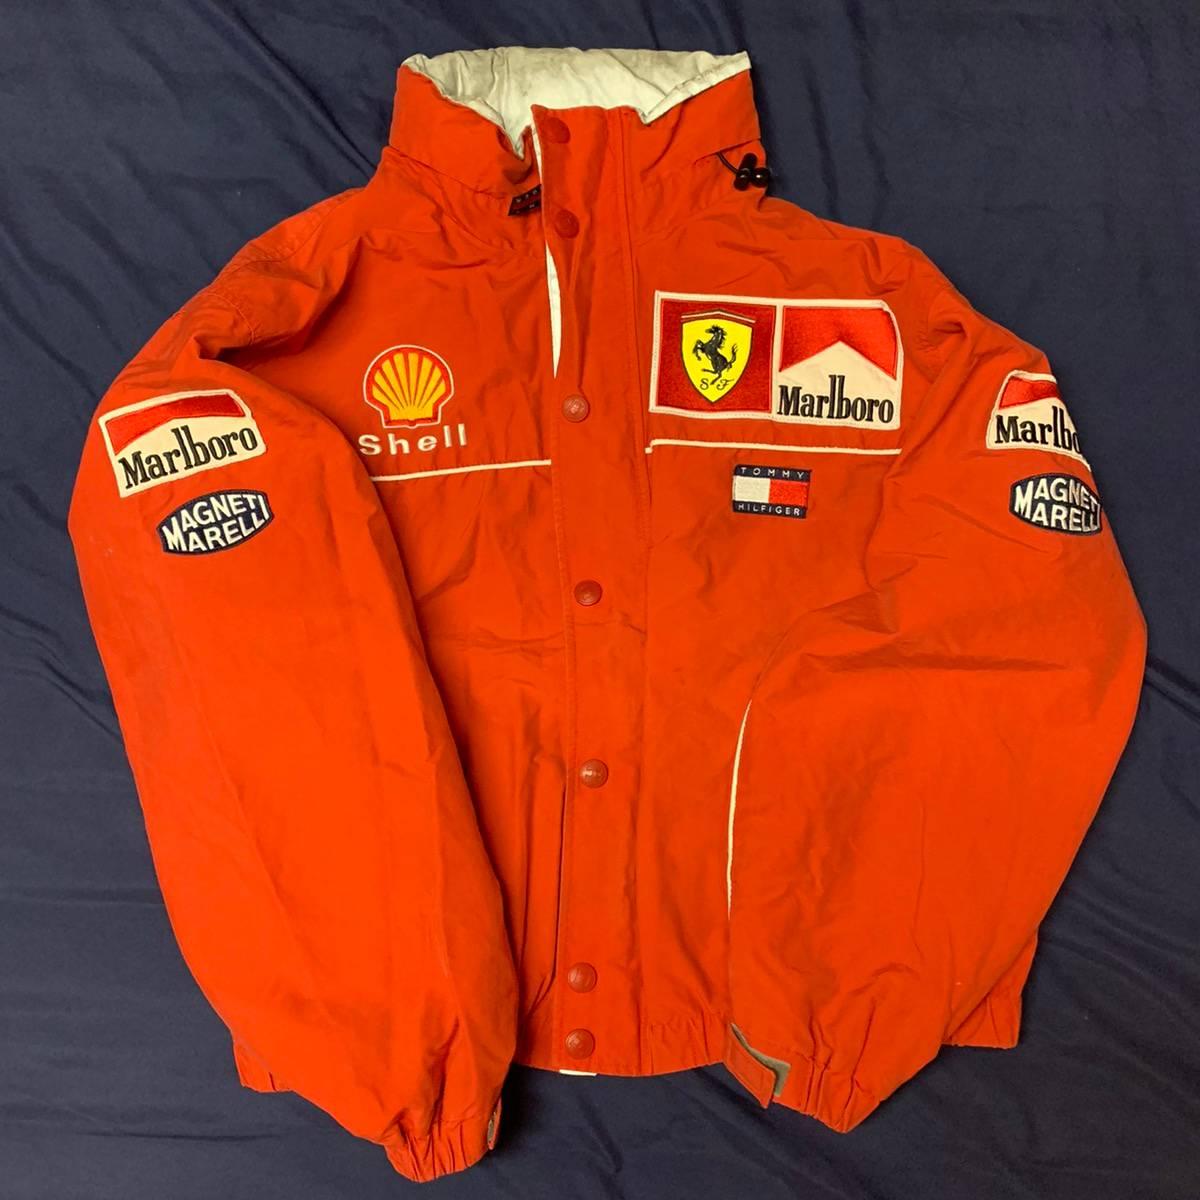 Tommy Hilfiger Ferrari F1 Racing Jacket By Tommy Hilfiger Grailed